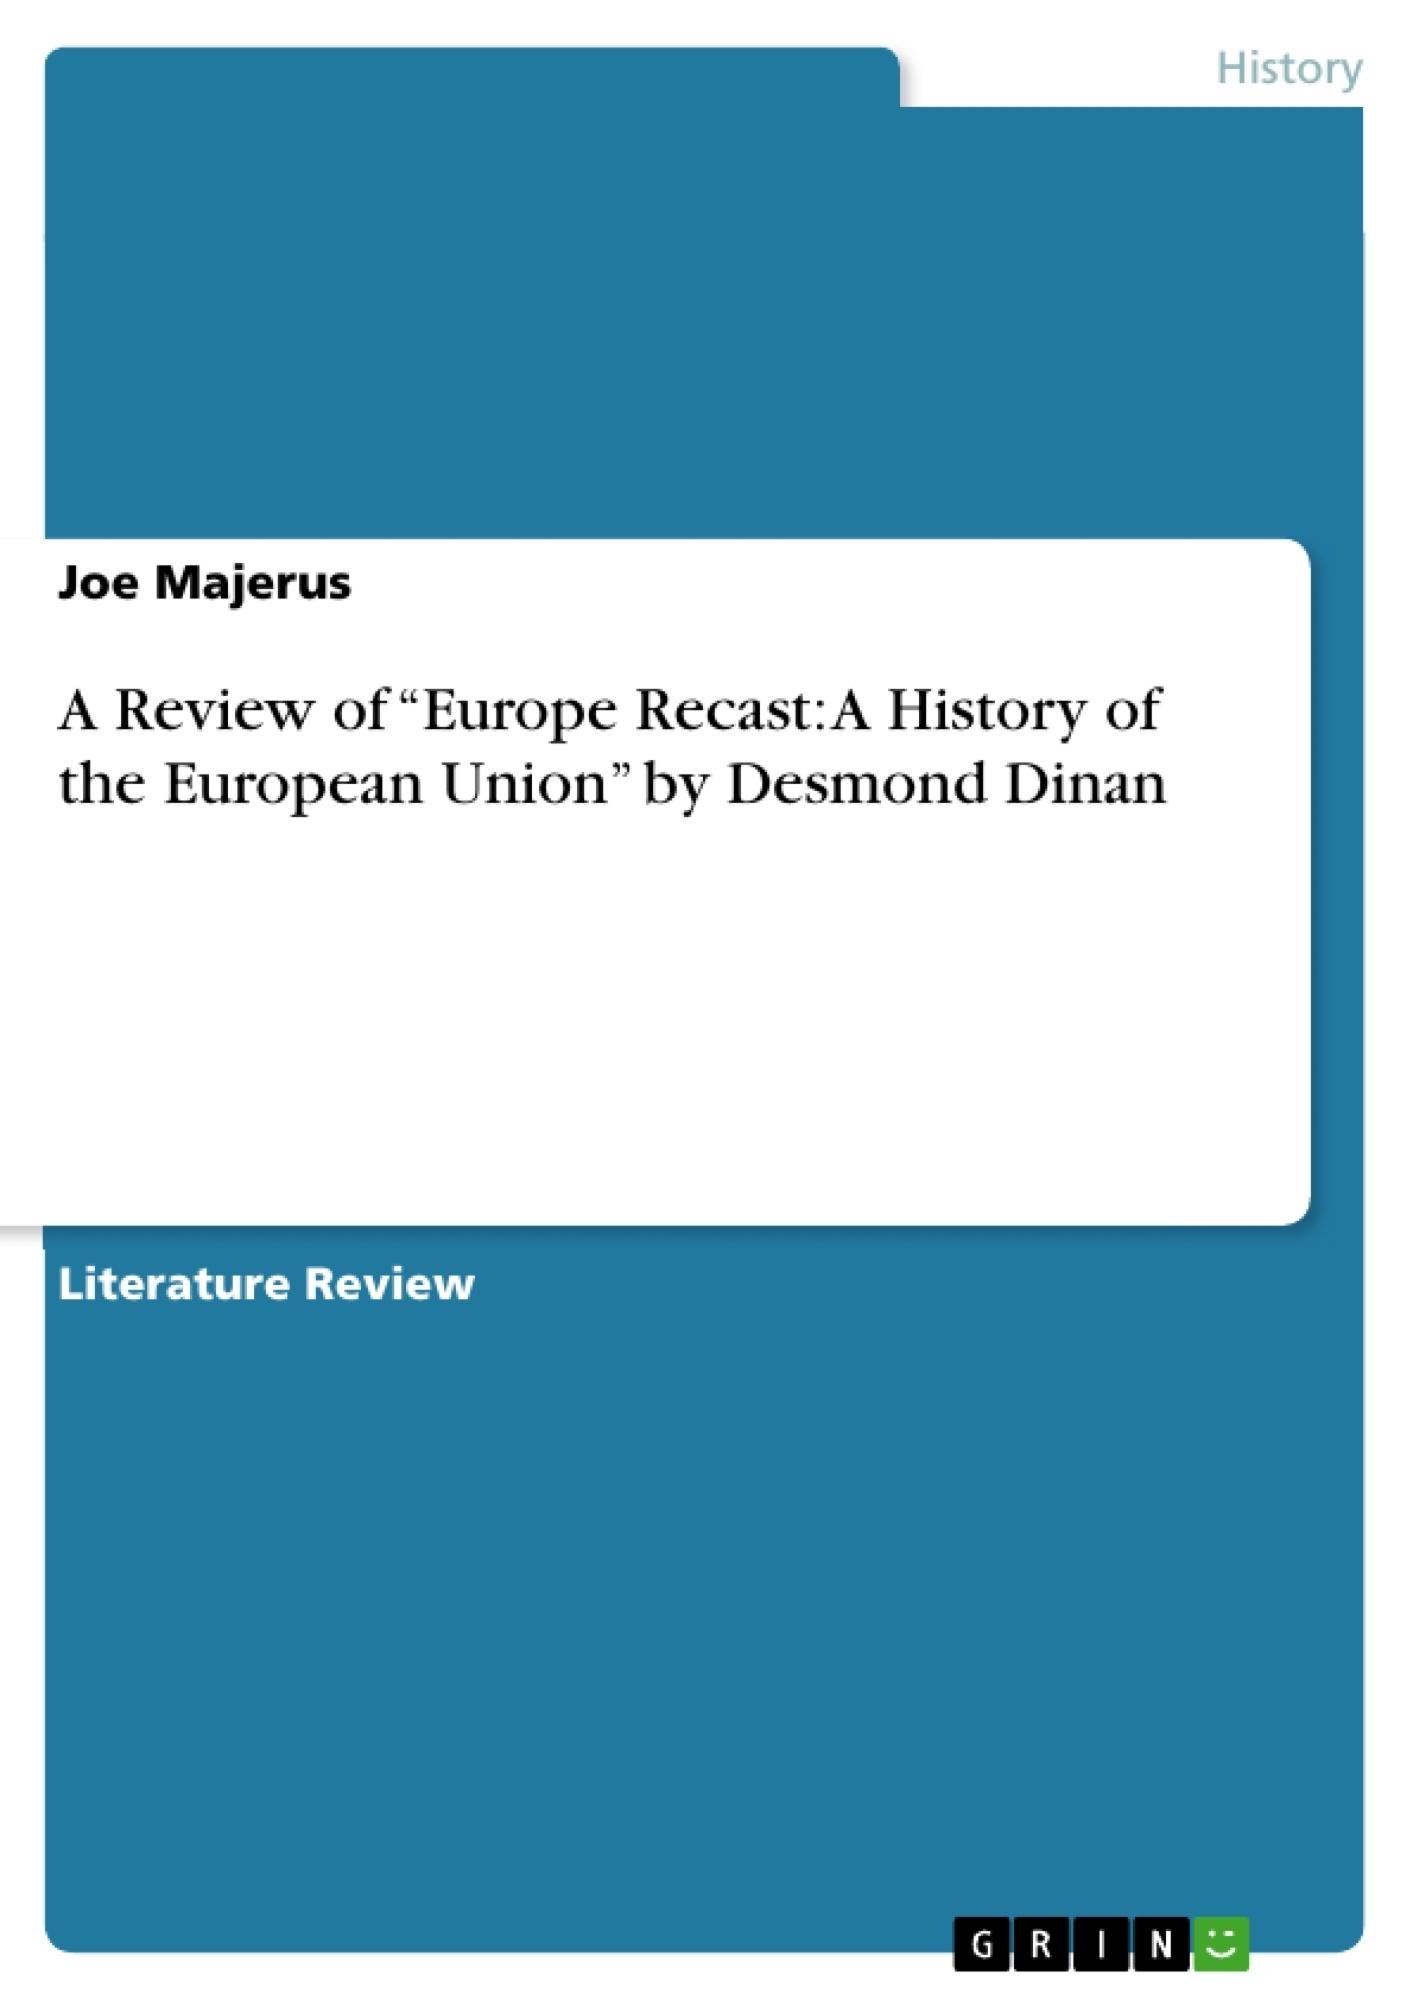 Free International Relations and Politics essays